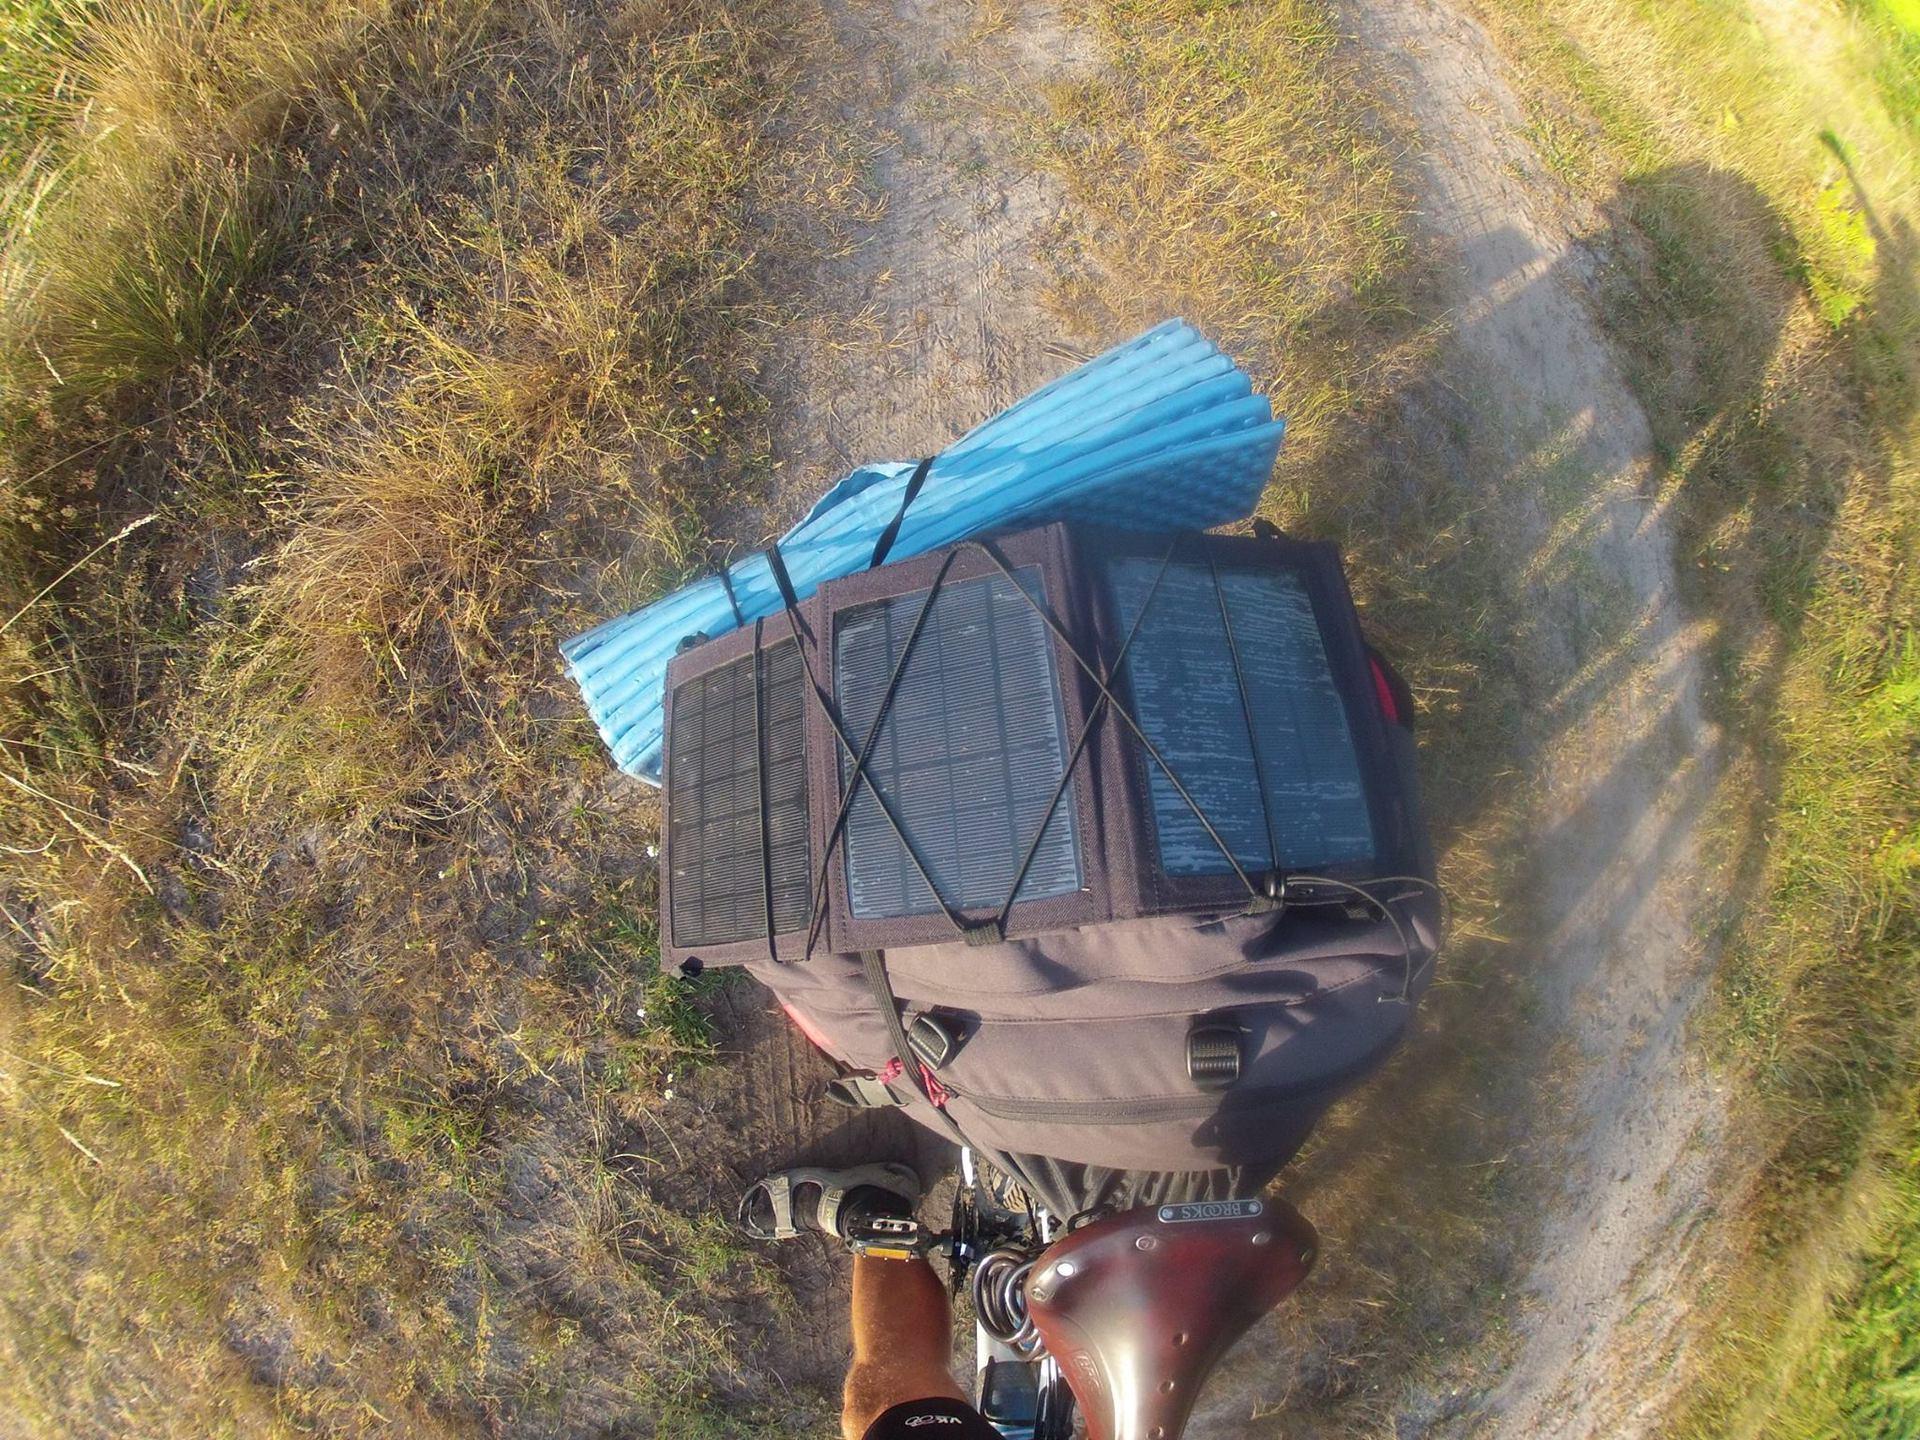 Фриланс из палатки - 2